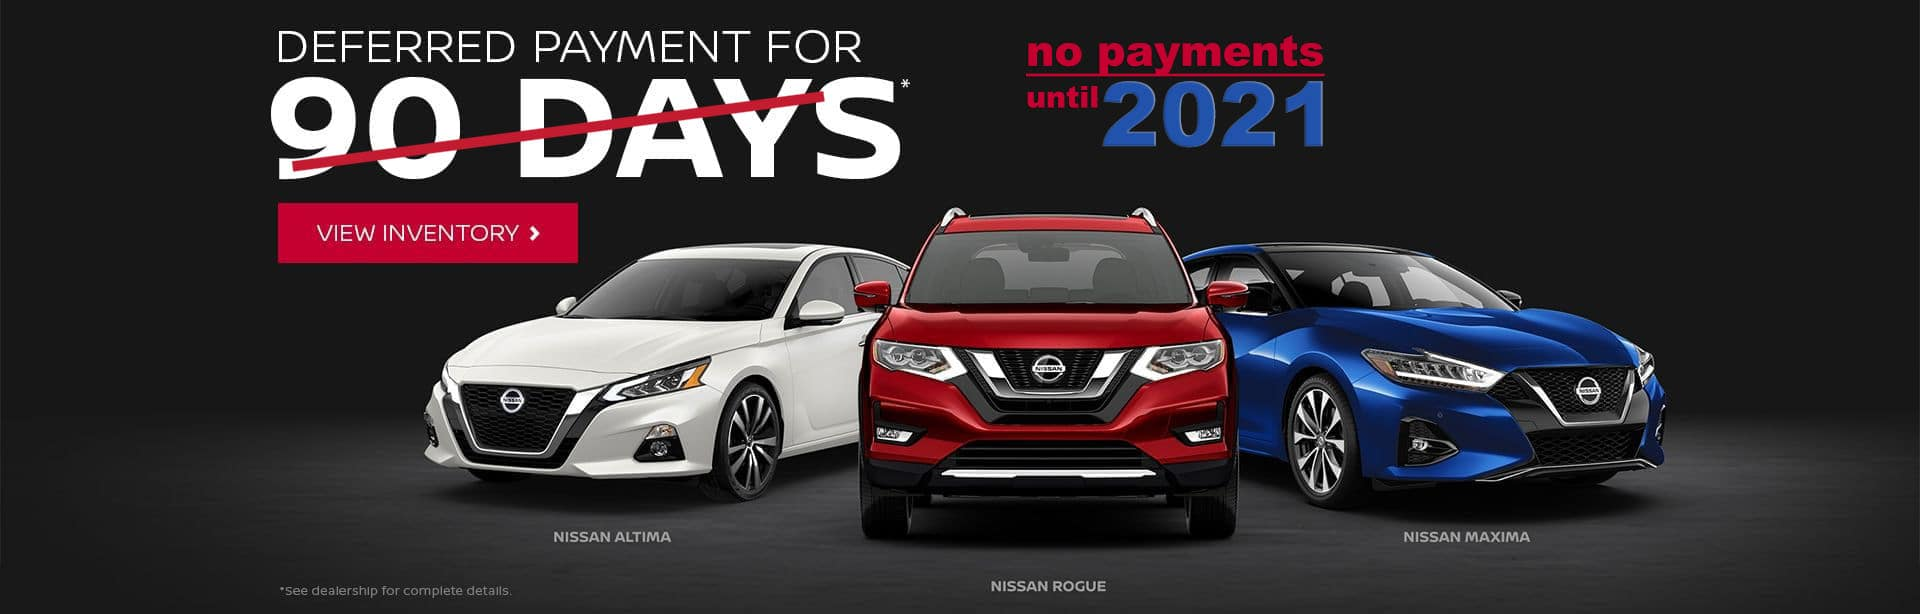 Nissan-of-Lumberton-no-payment_until-2021